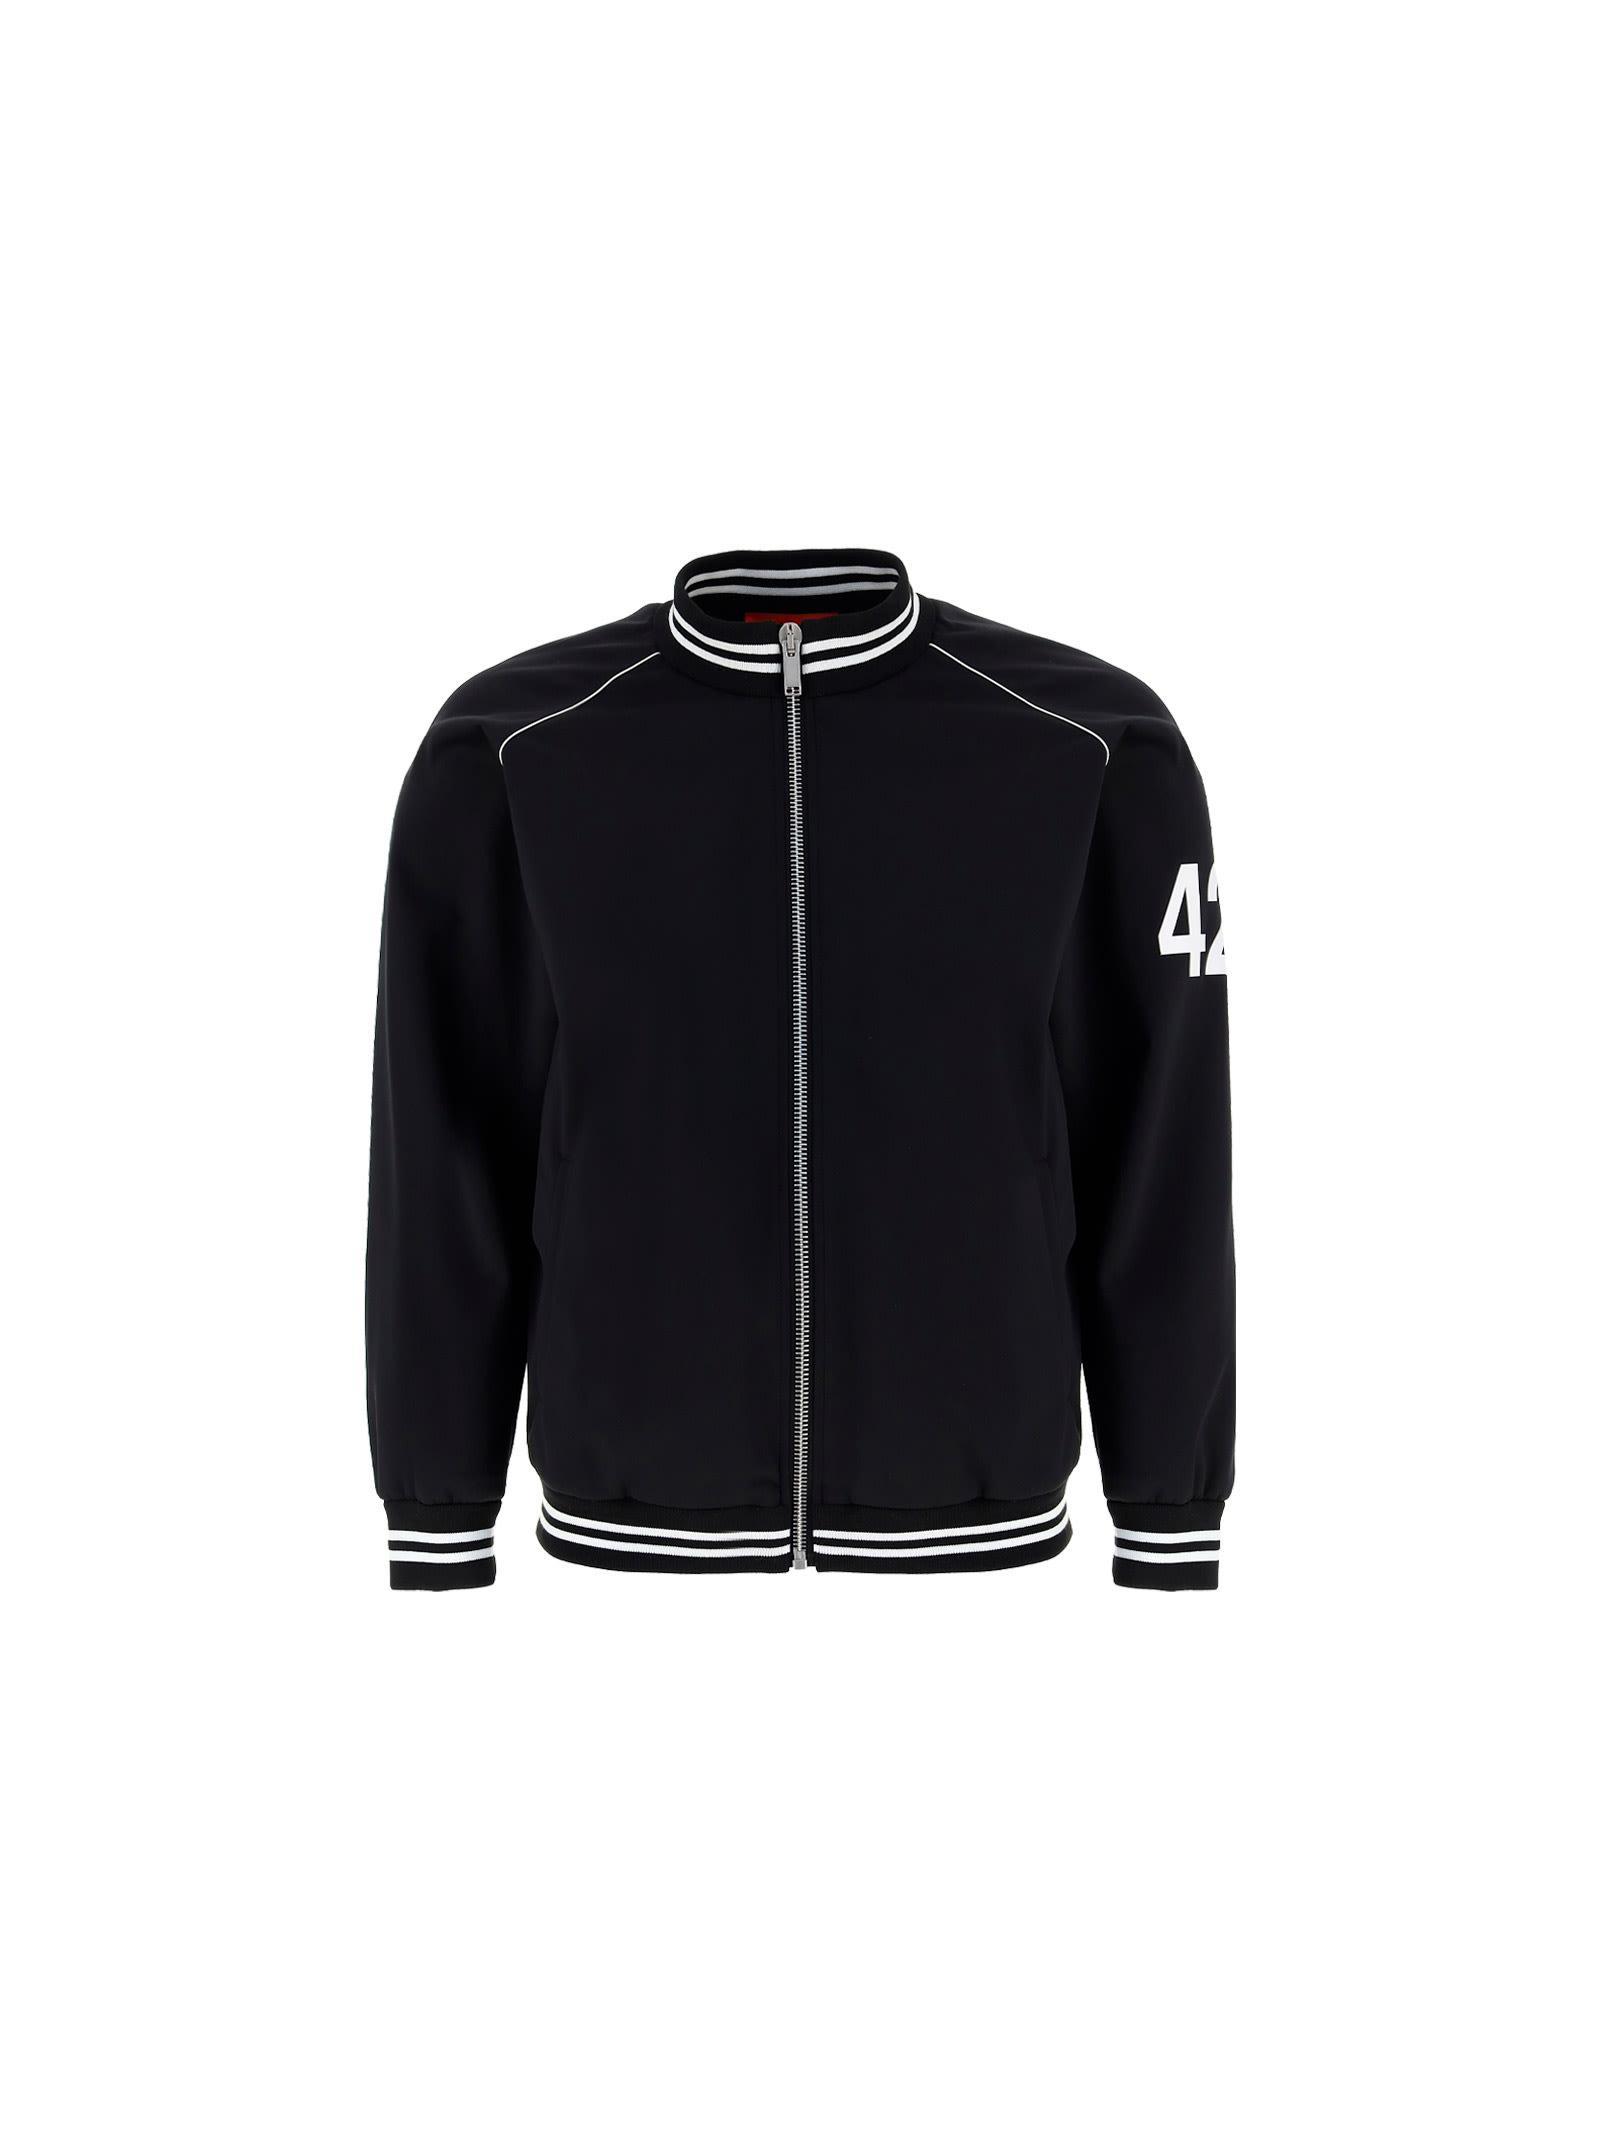 424 Inc Down Jacket